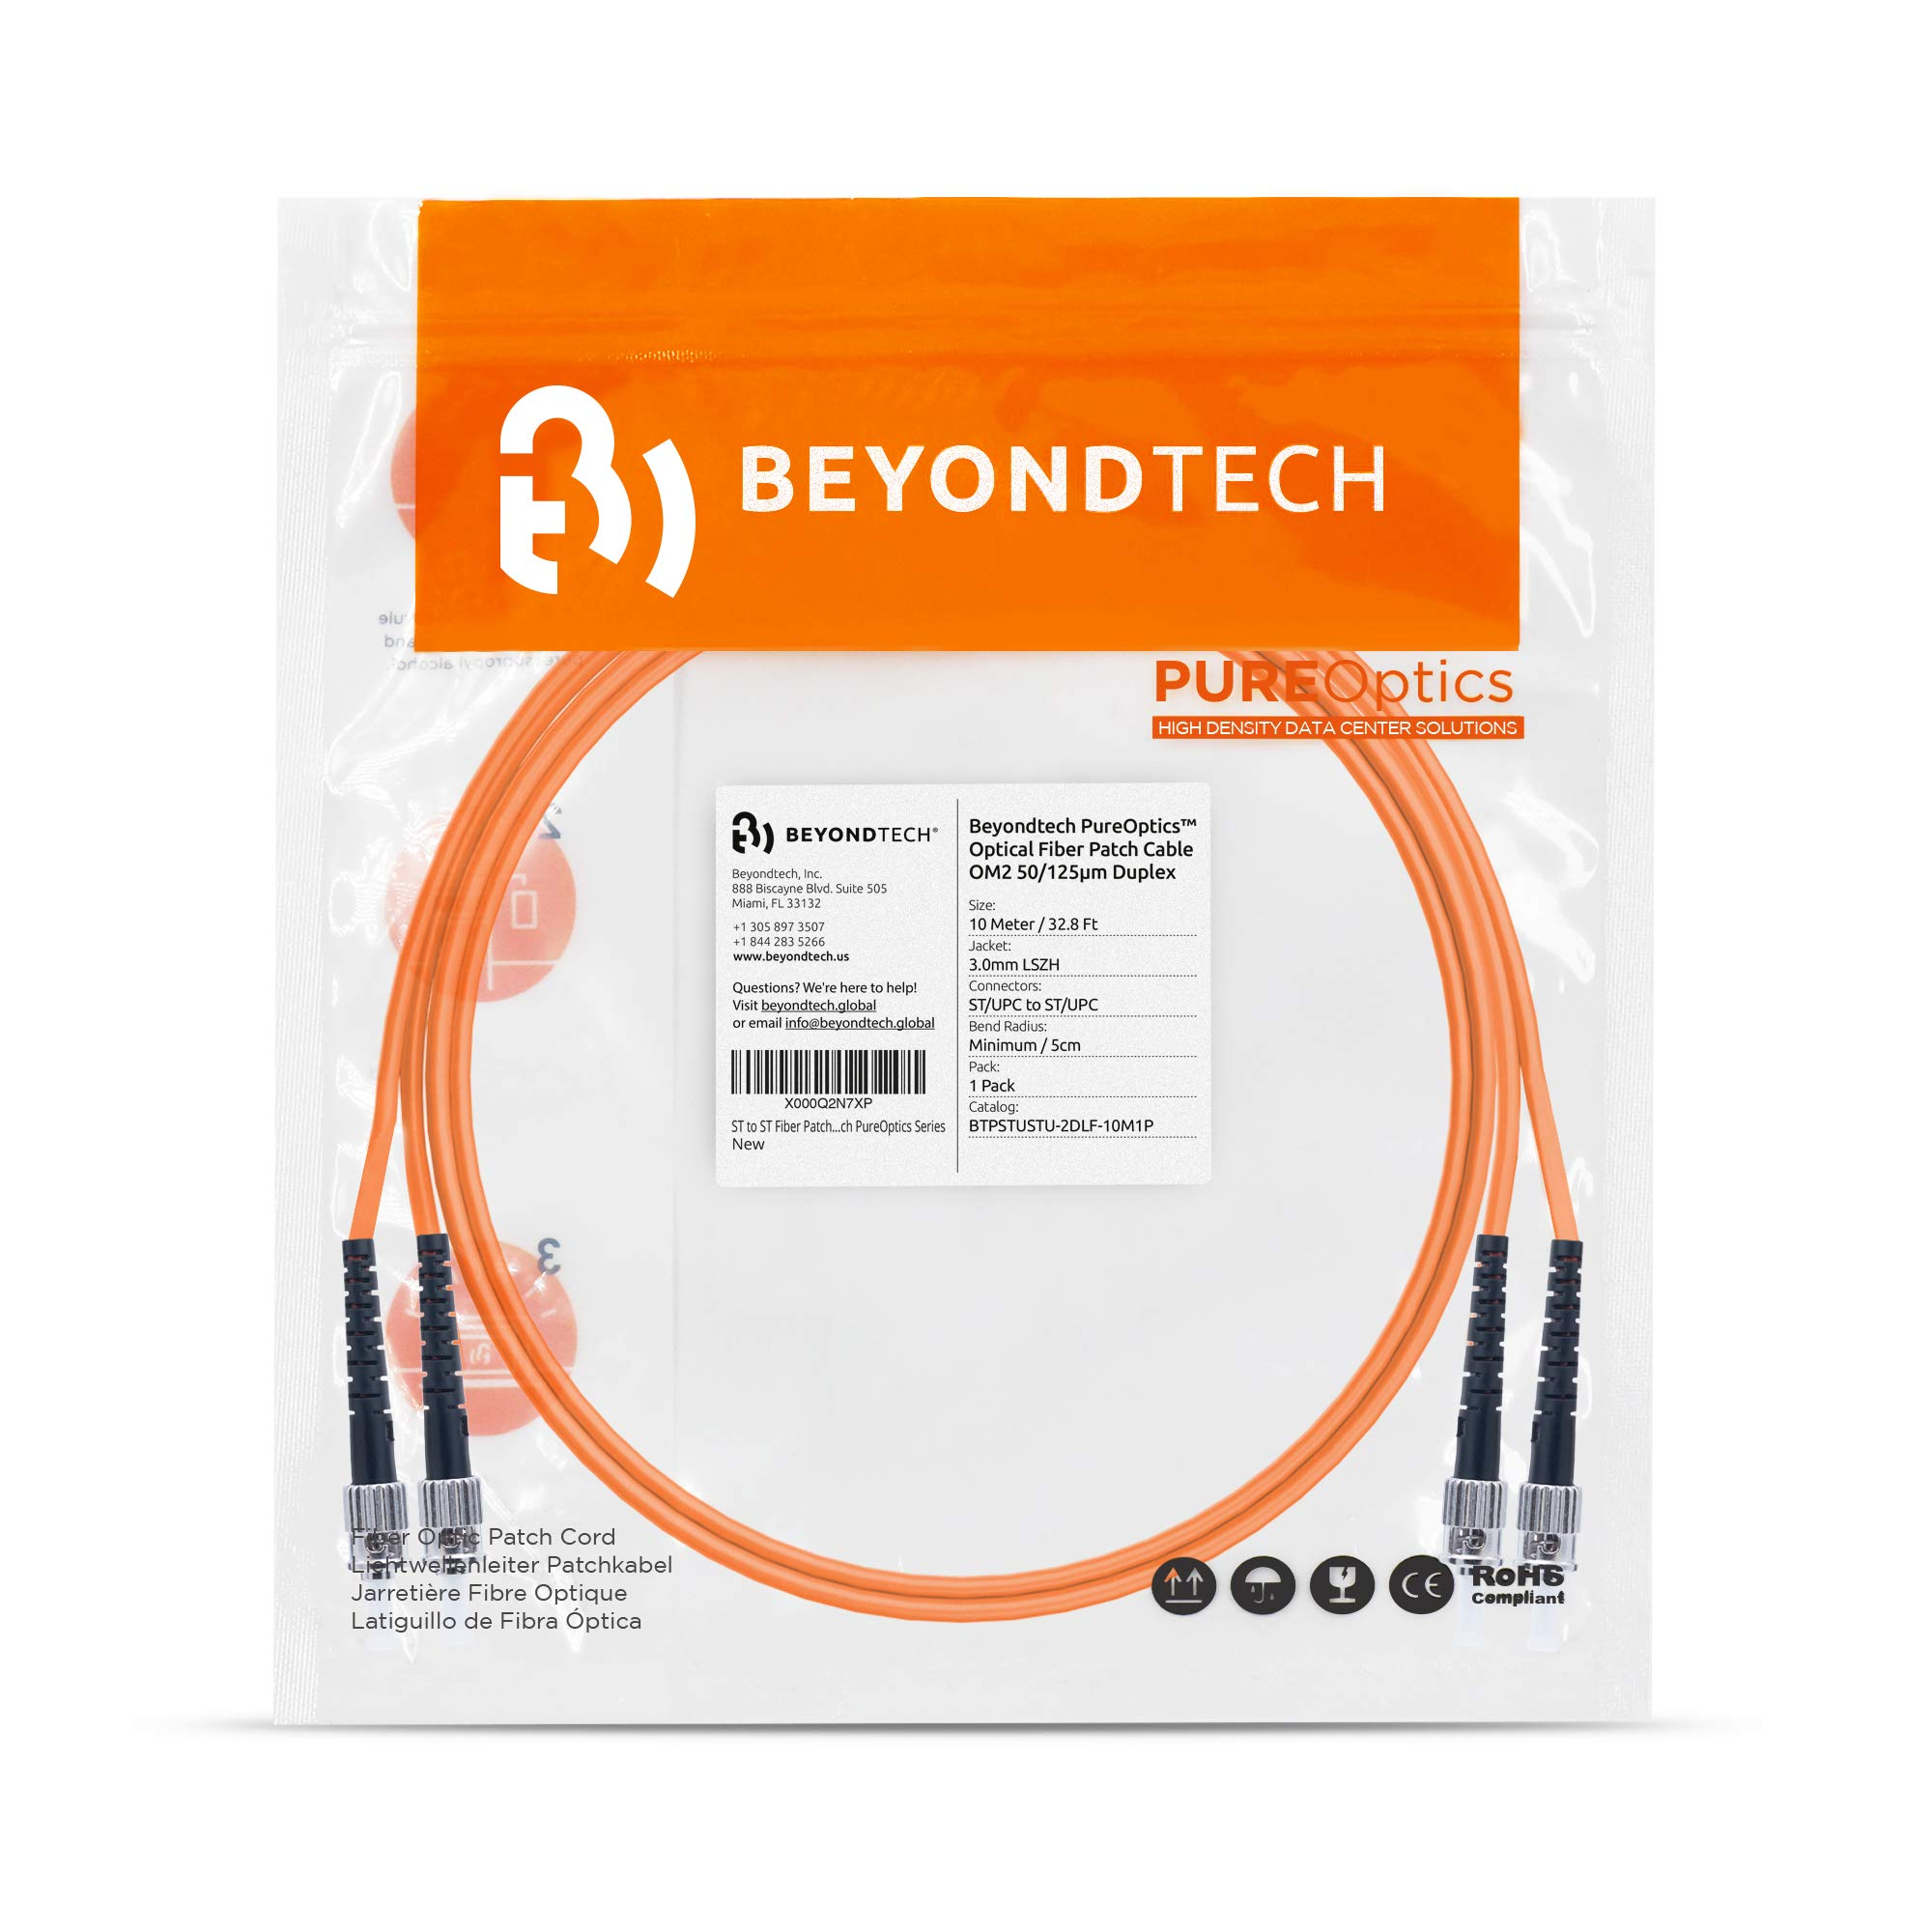 FC to FC Fiber Patch Cable Multimode Duplex 5m 16.4ft Beyondtech PureOptics Cable Series - 50//125um OM2